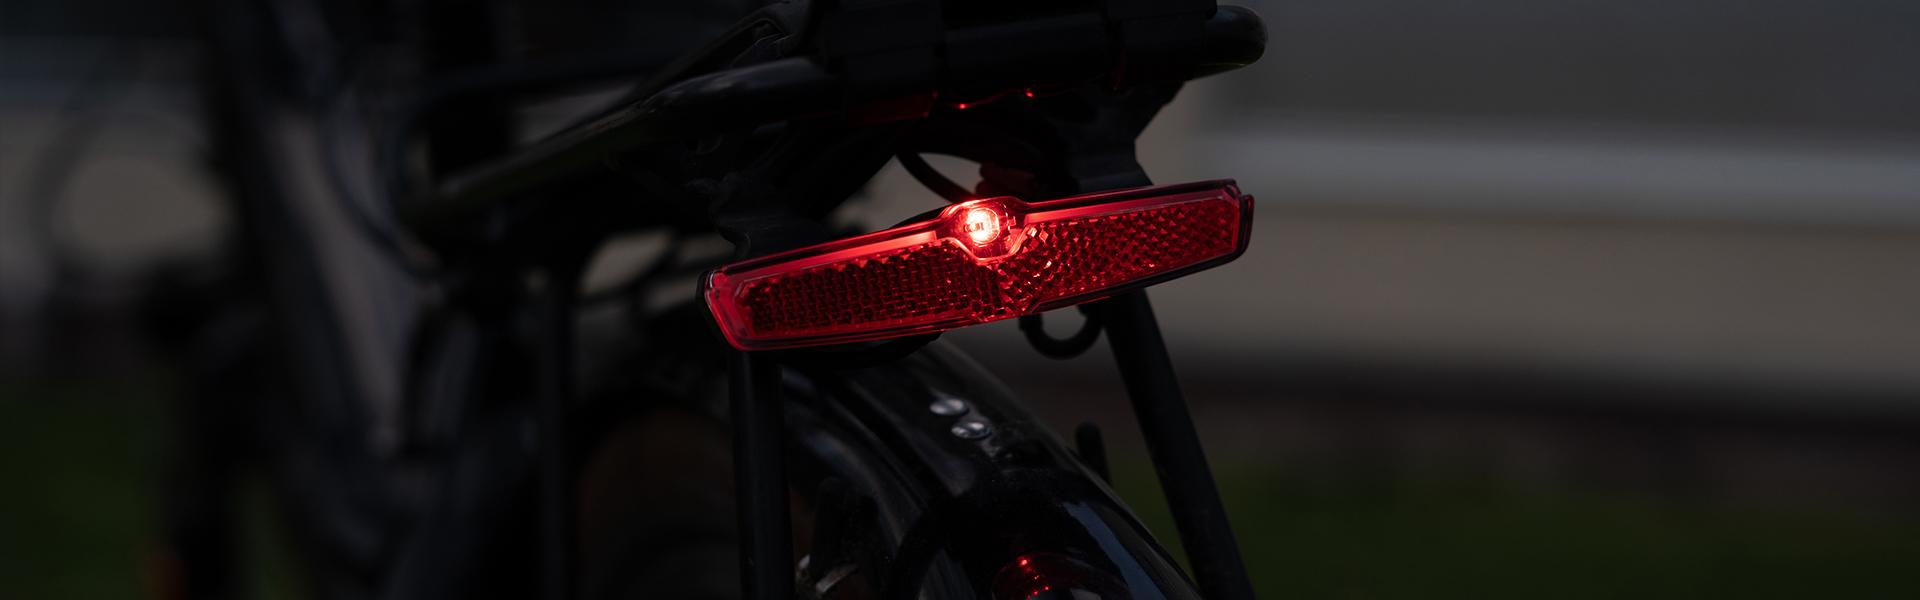 Sate-lite  ebike light ECE R113  ECE R87 eletric bike headlight  12-55V